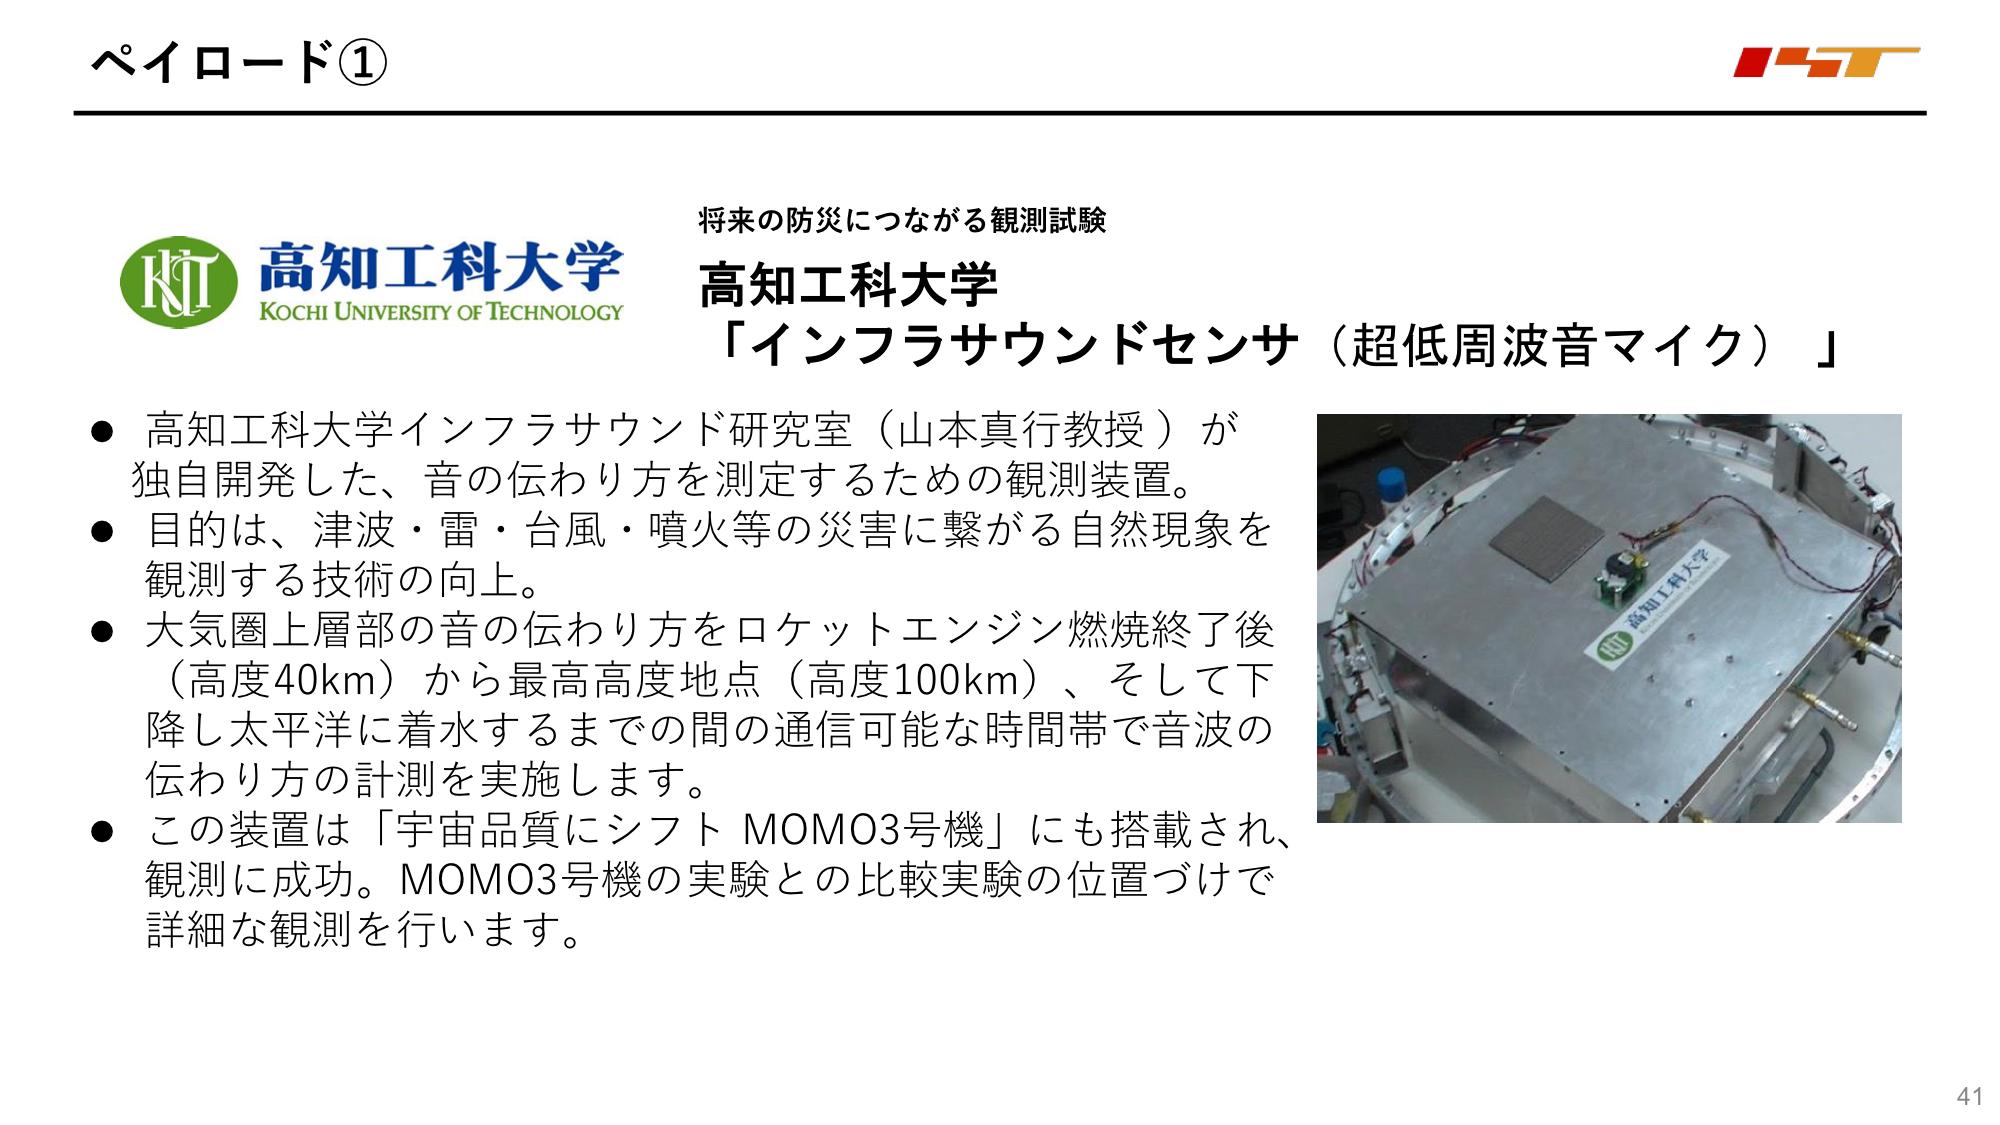 f:id:Imamura:20200603233135p:plain